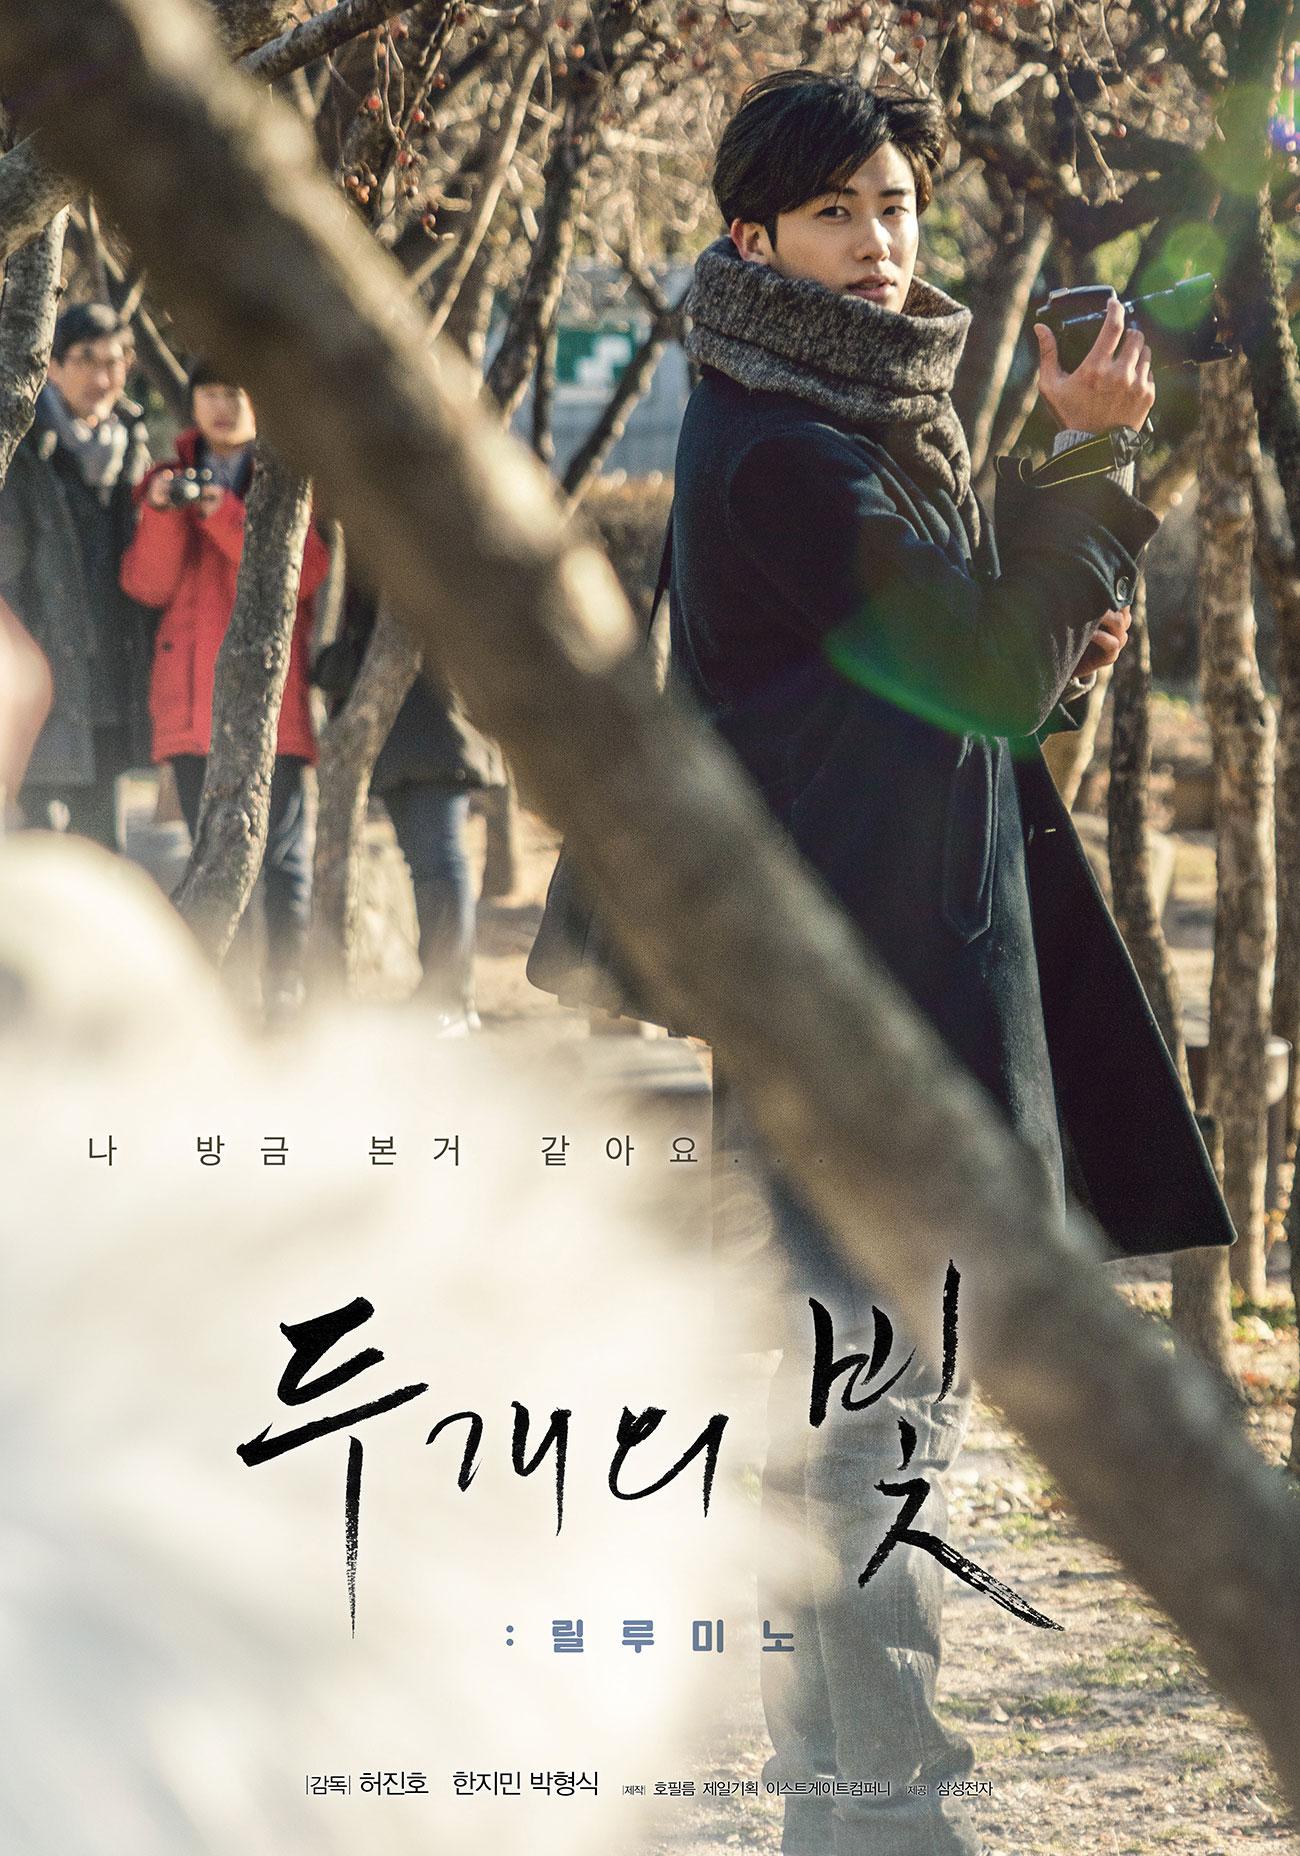 Two Lights: Relumino - Park Hyung Sik